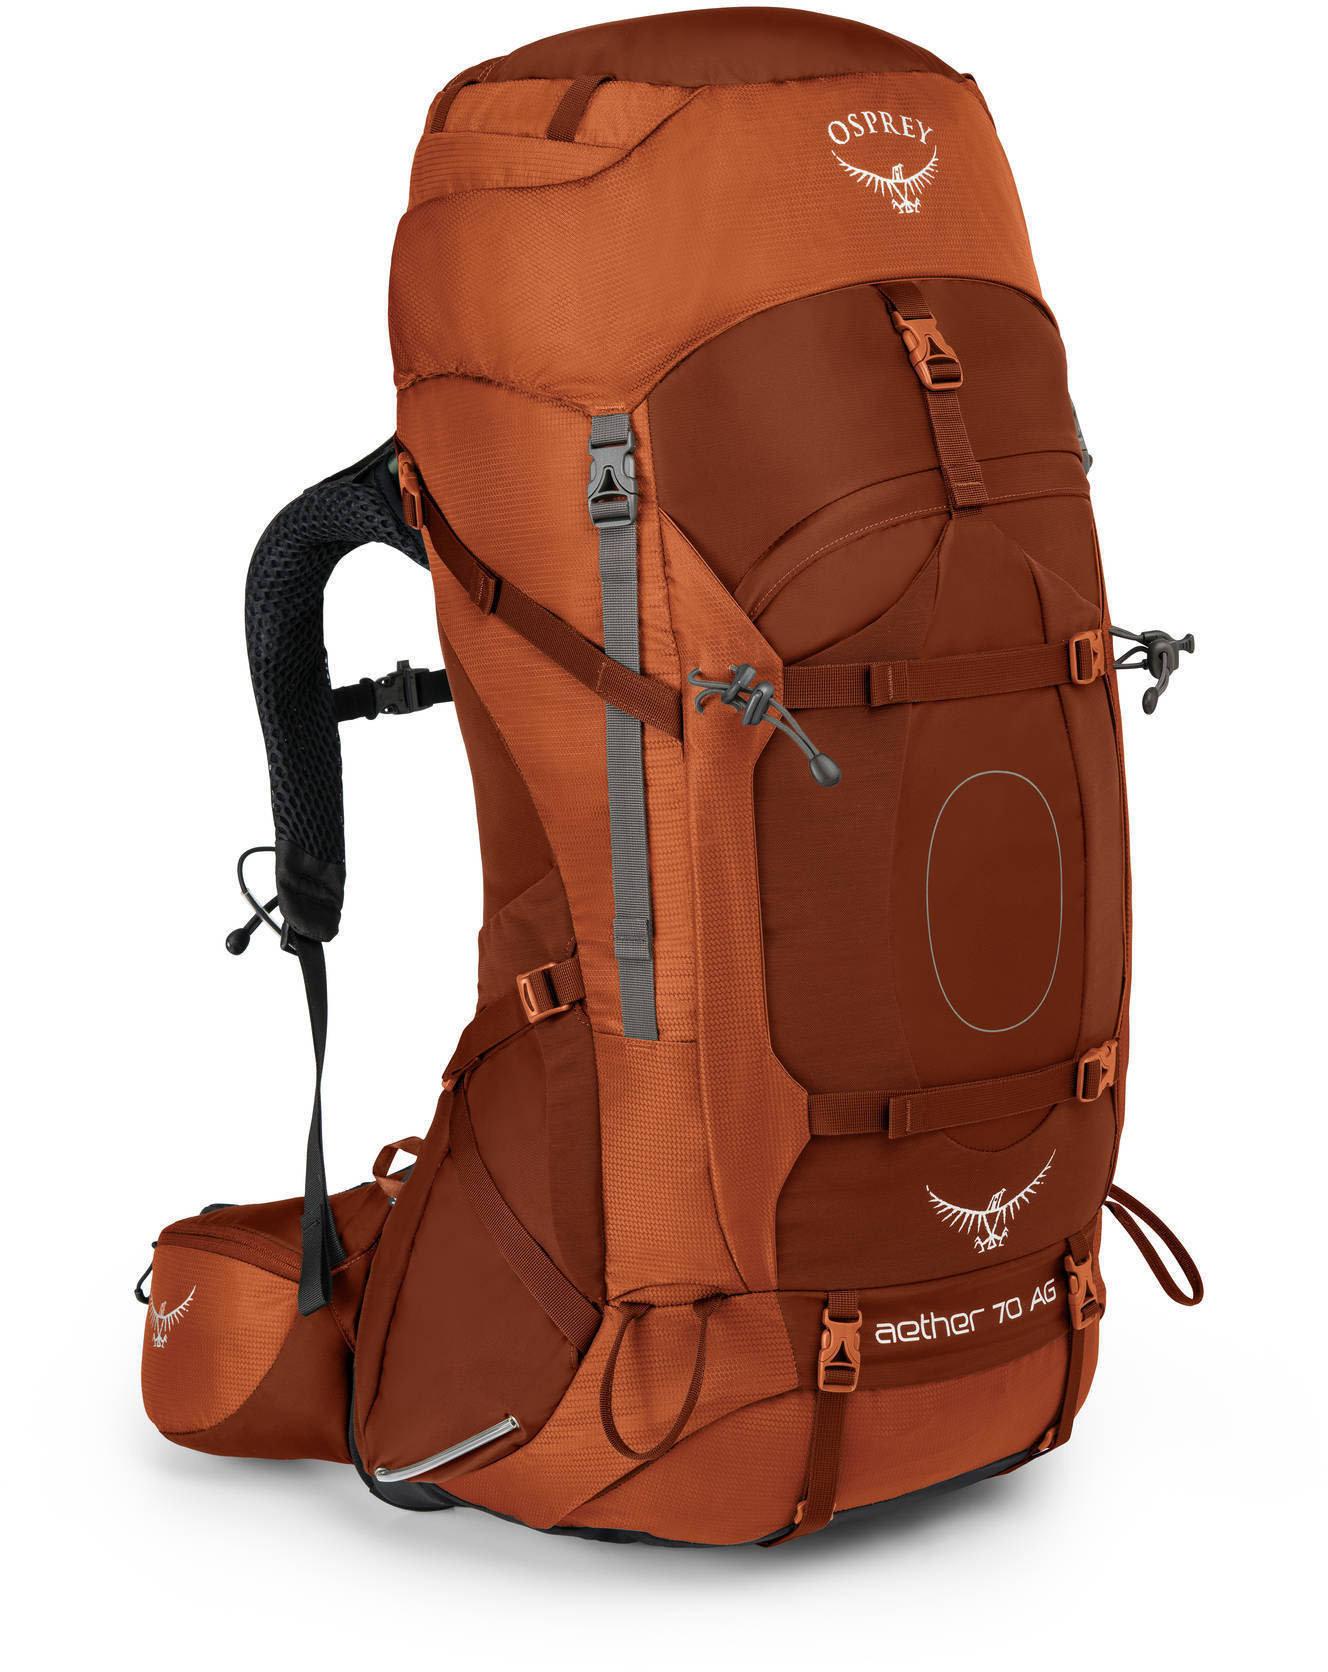 Рюкзак туристический Osprey Aether AG 70 (цвет: Outback Orange)